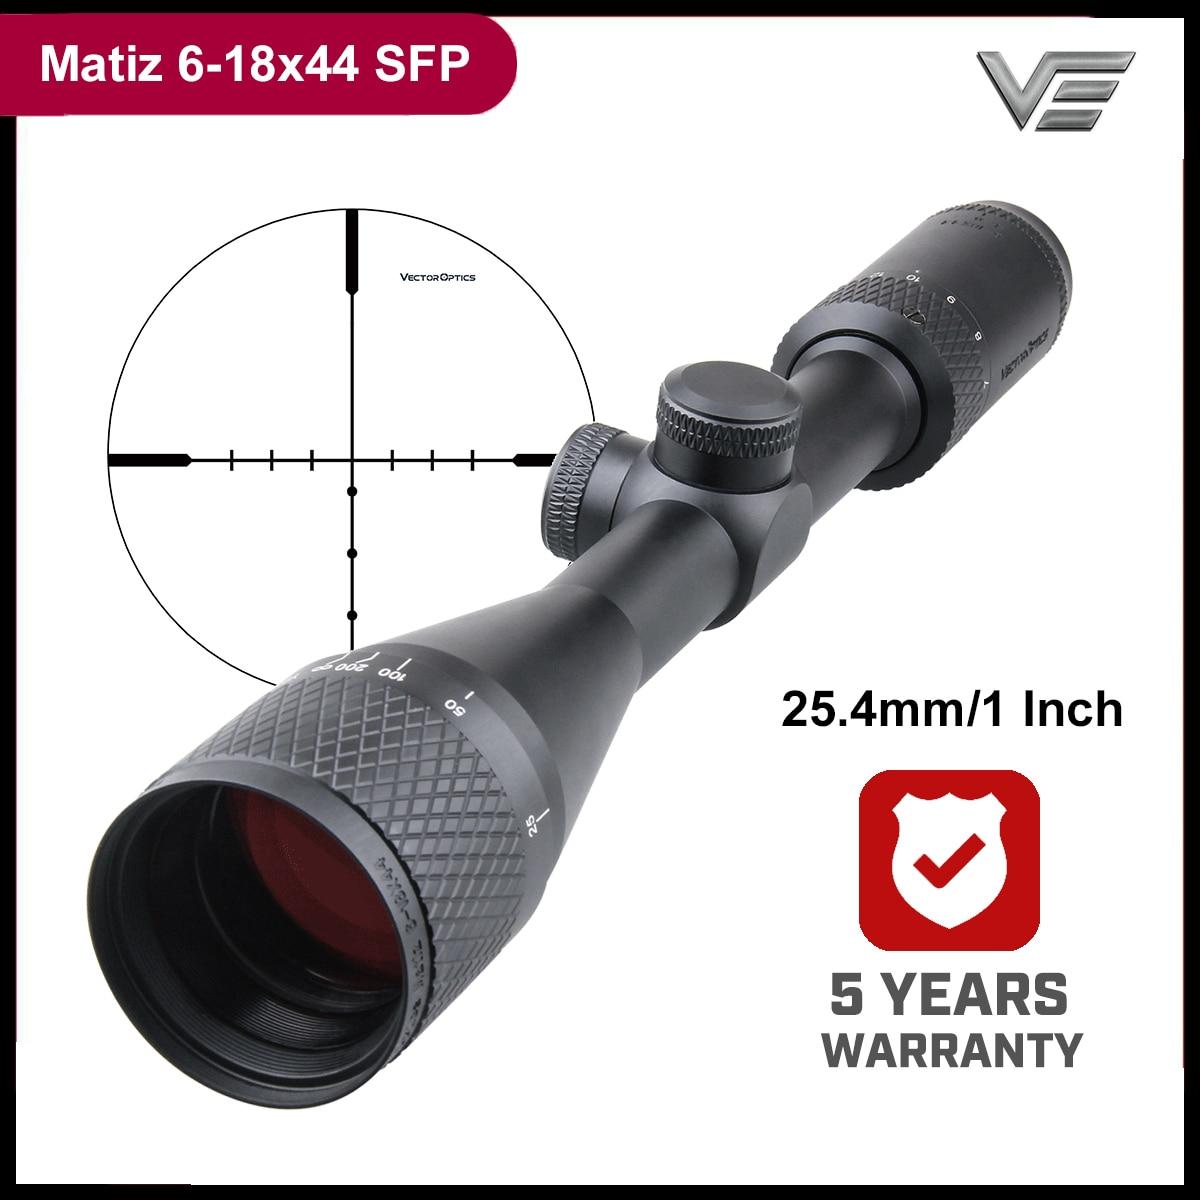 Vector Optics Matiz 6-18x44 Tactical Riflescope High Quality 25.4mm 1'' Tube Diameter 1/4 MOA Adjustment 3x Zoom